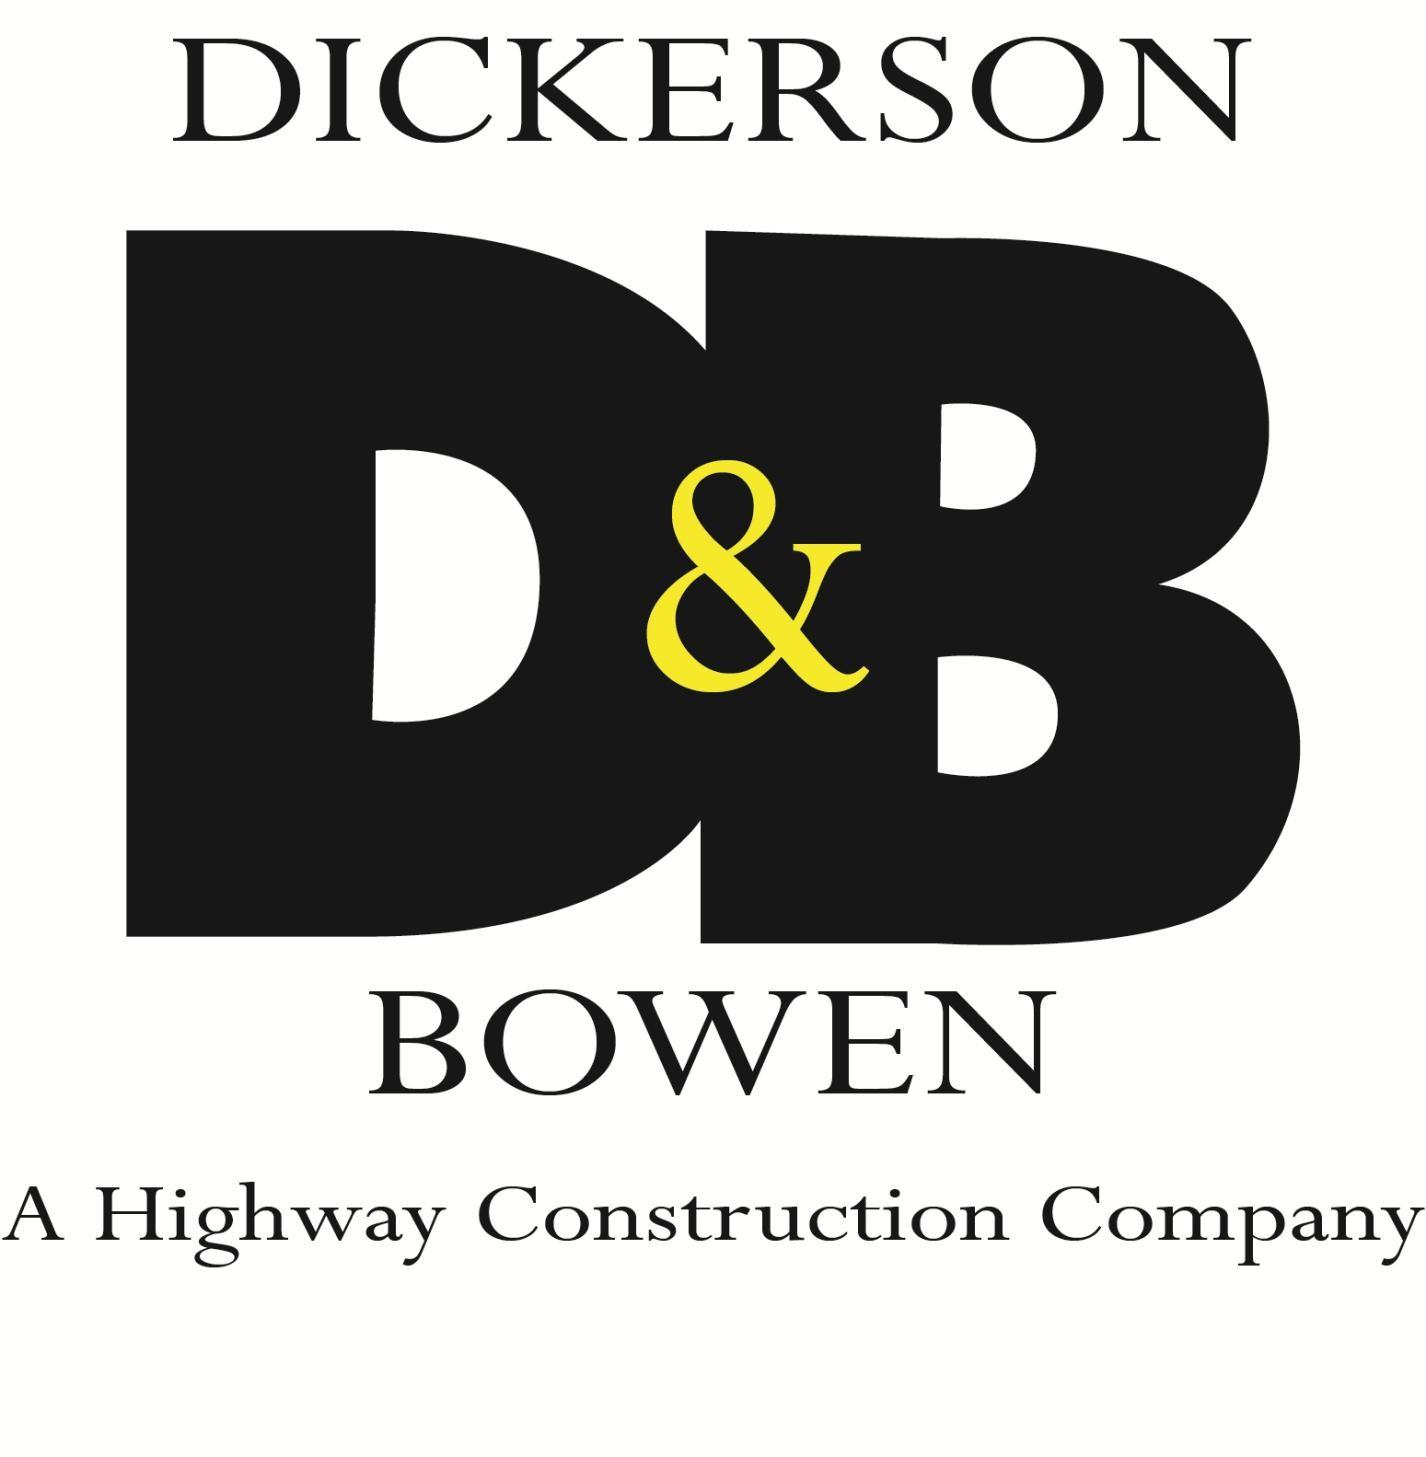 Dickerson & Bowen